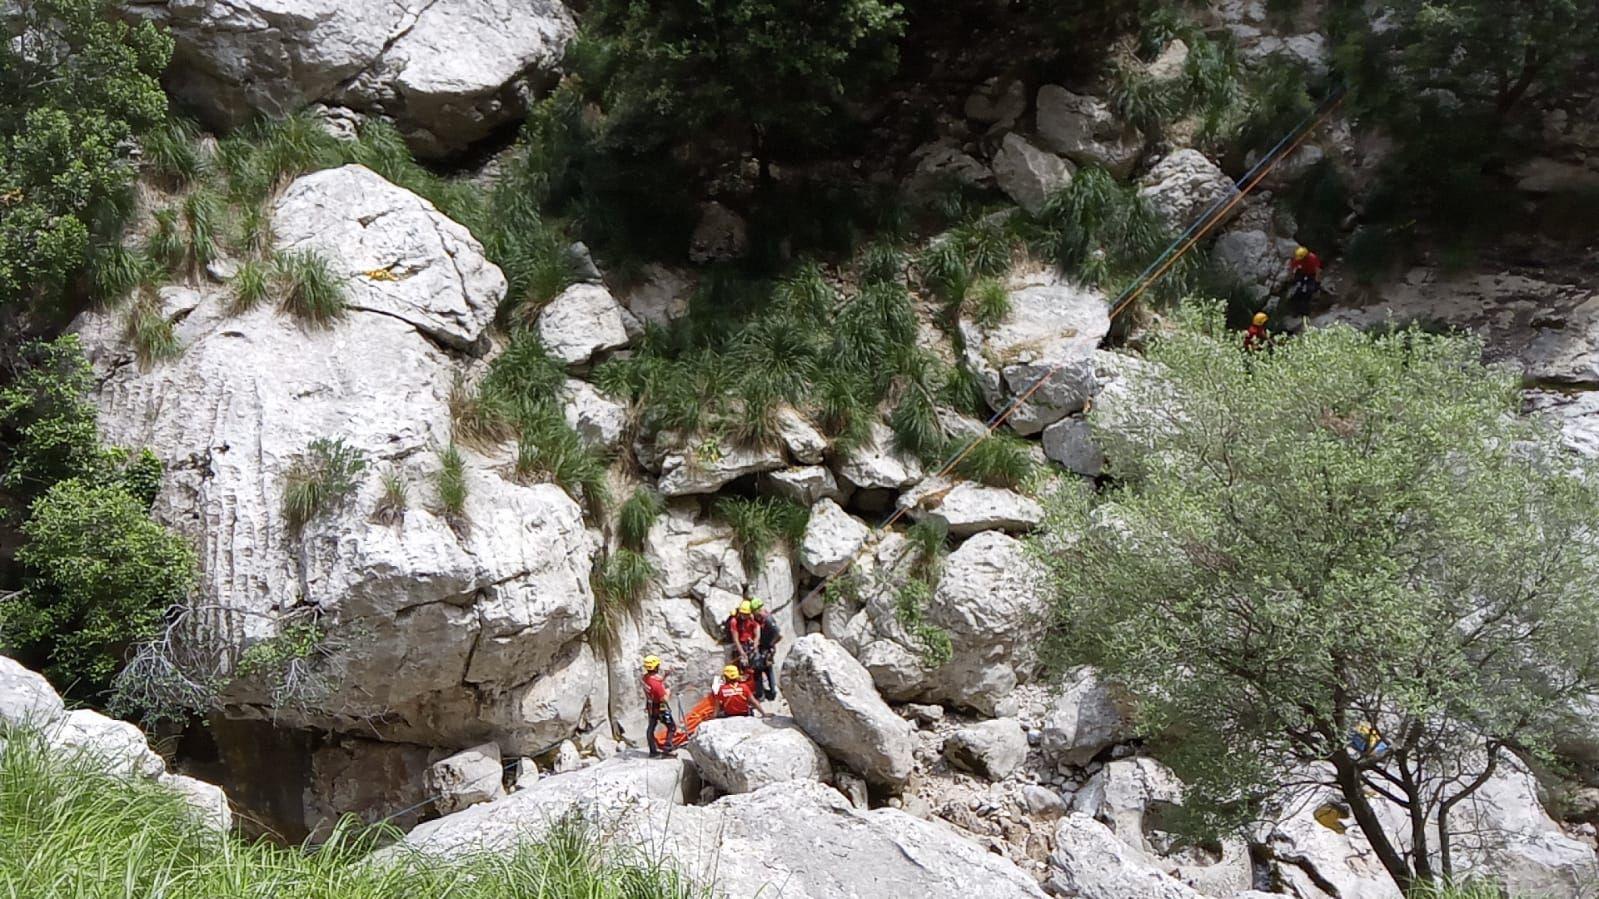 Rescatan a un excursionista en Escorca